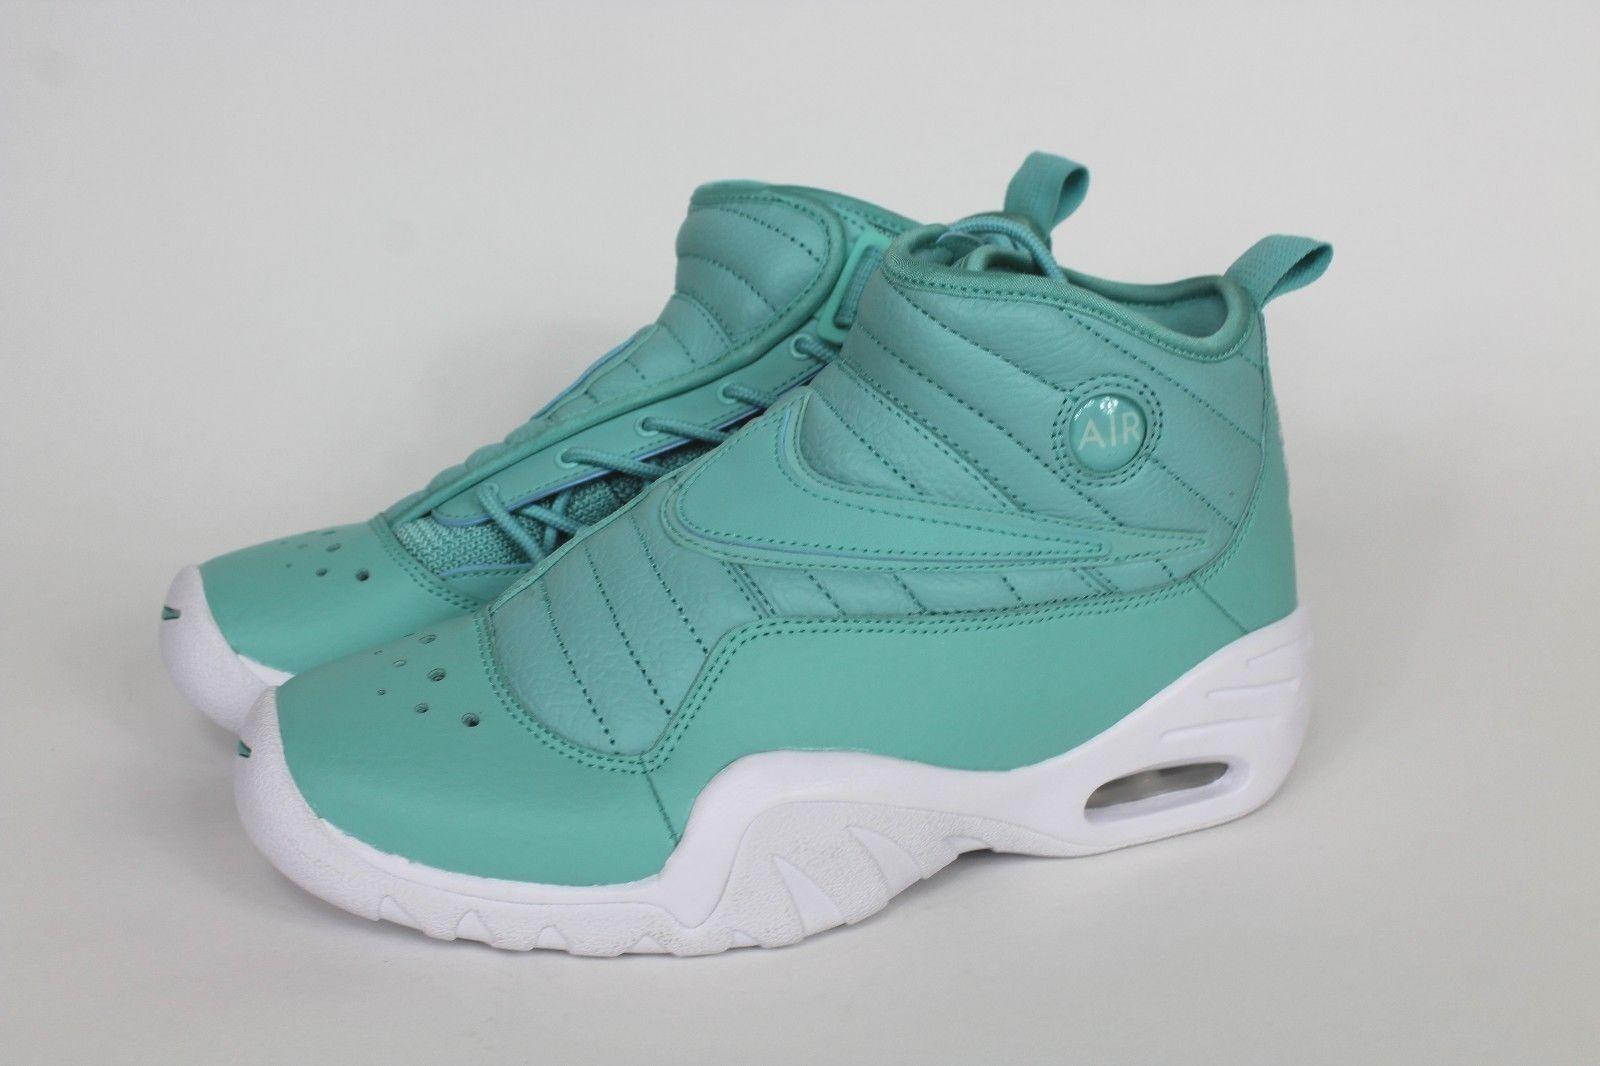 Nike Air Shake Ndestrukt GS  Cheap and fashionable